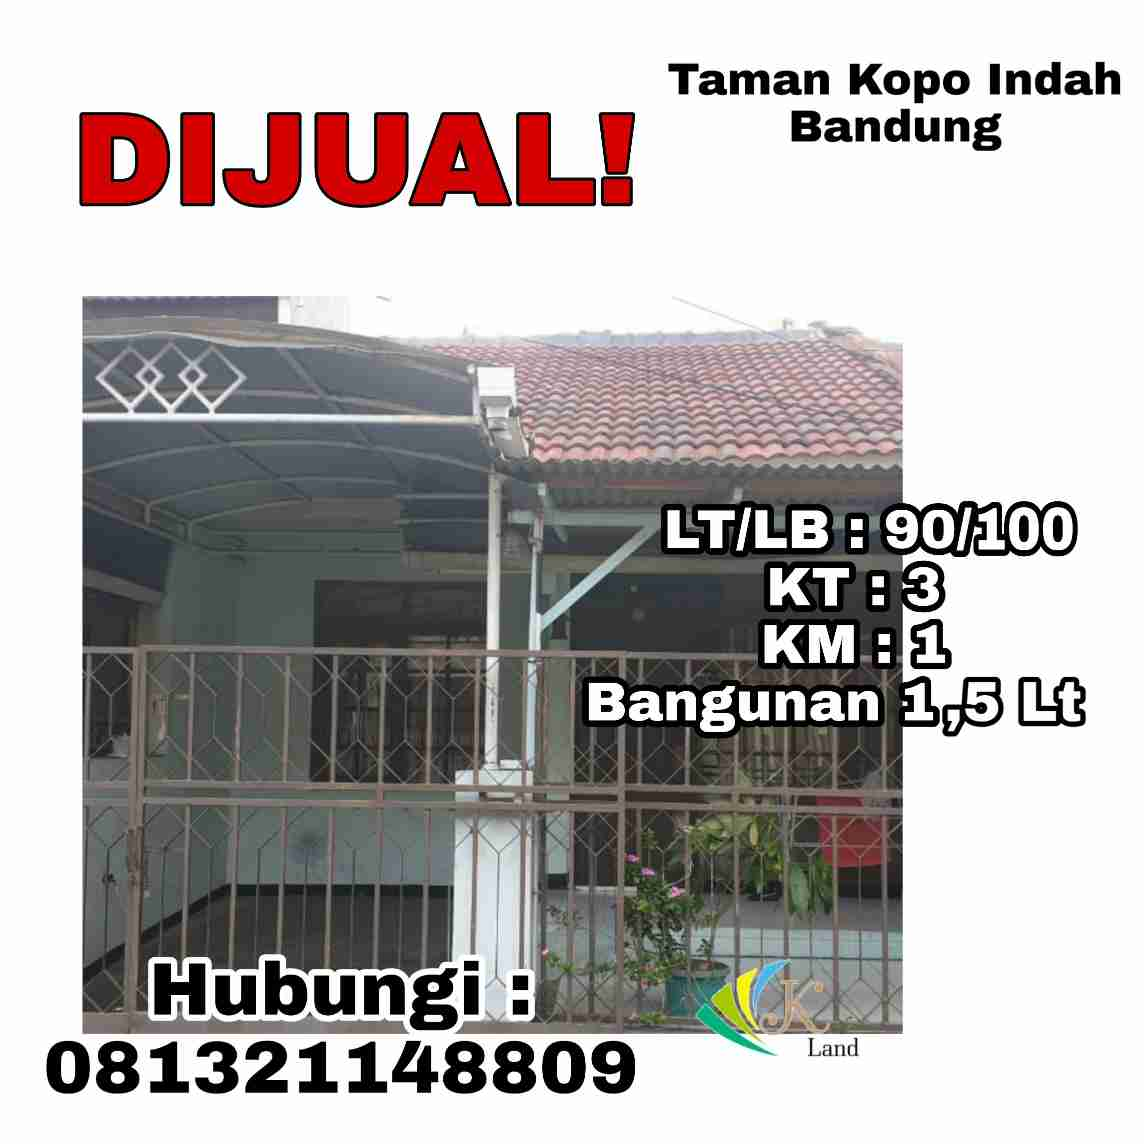 Dijual Rumah Taman Kopo Indah 2, Bandung ( Blok Patung Kuda )